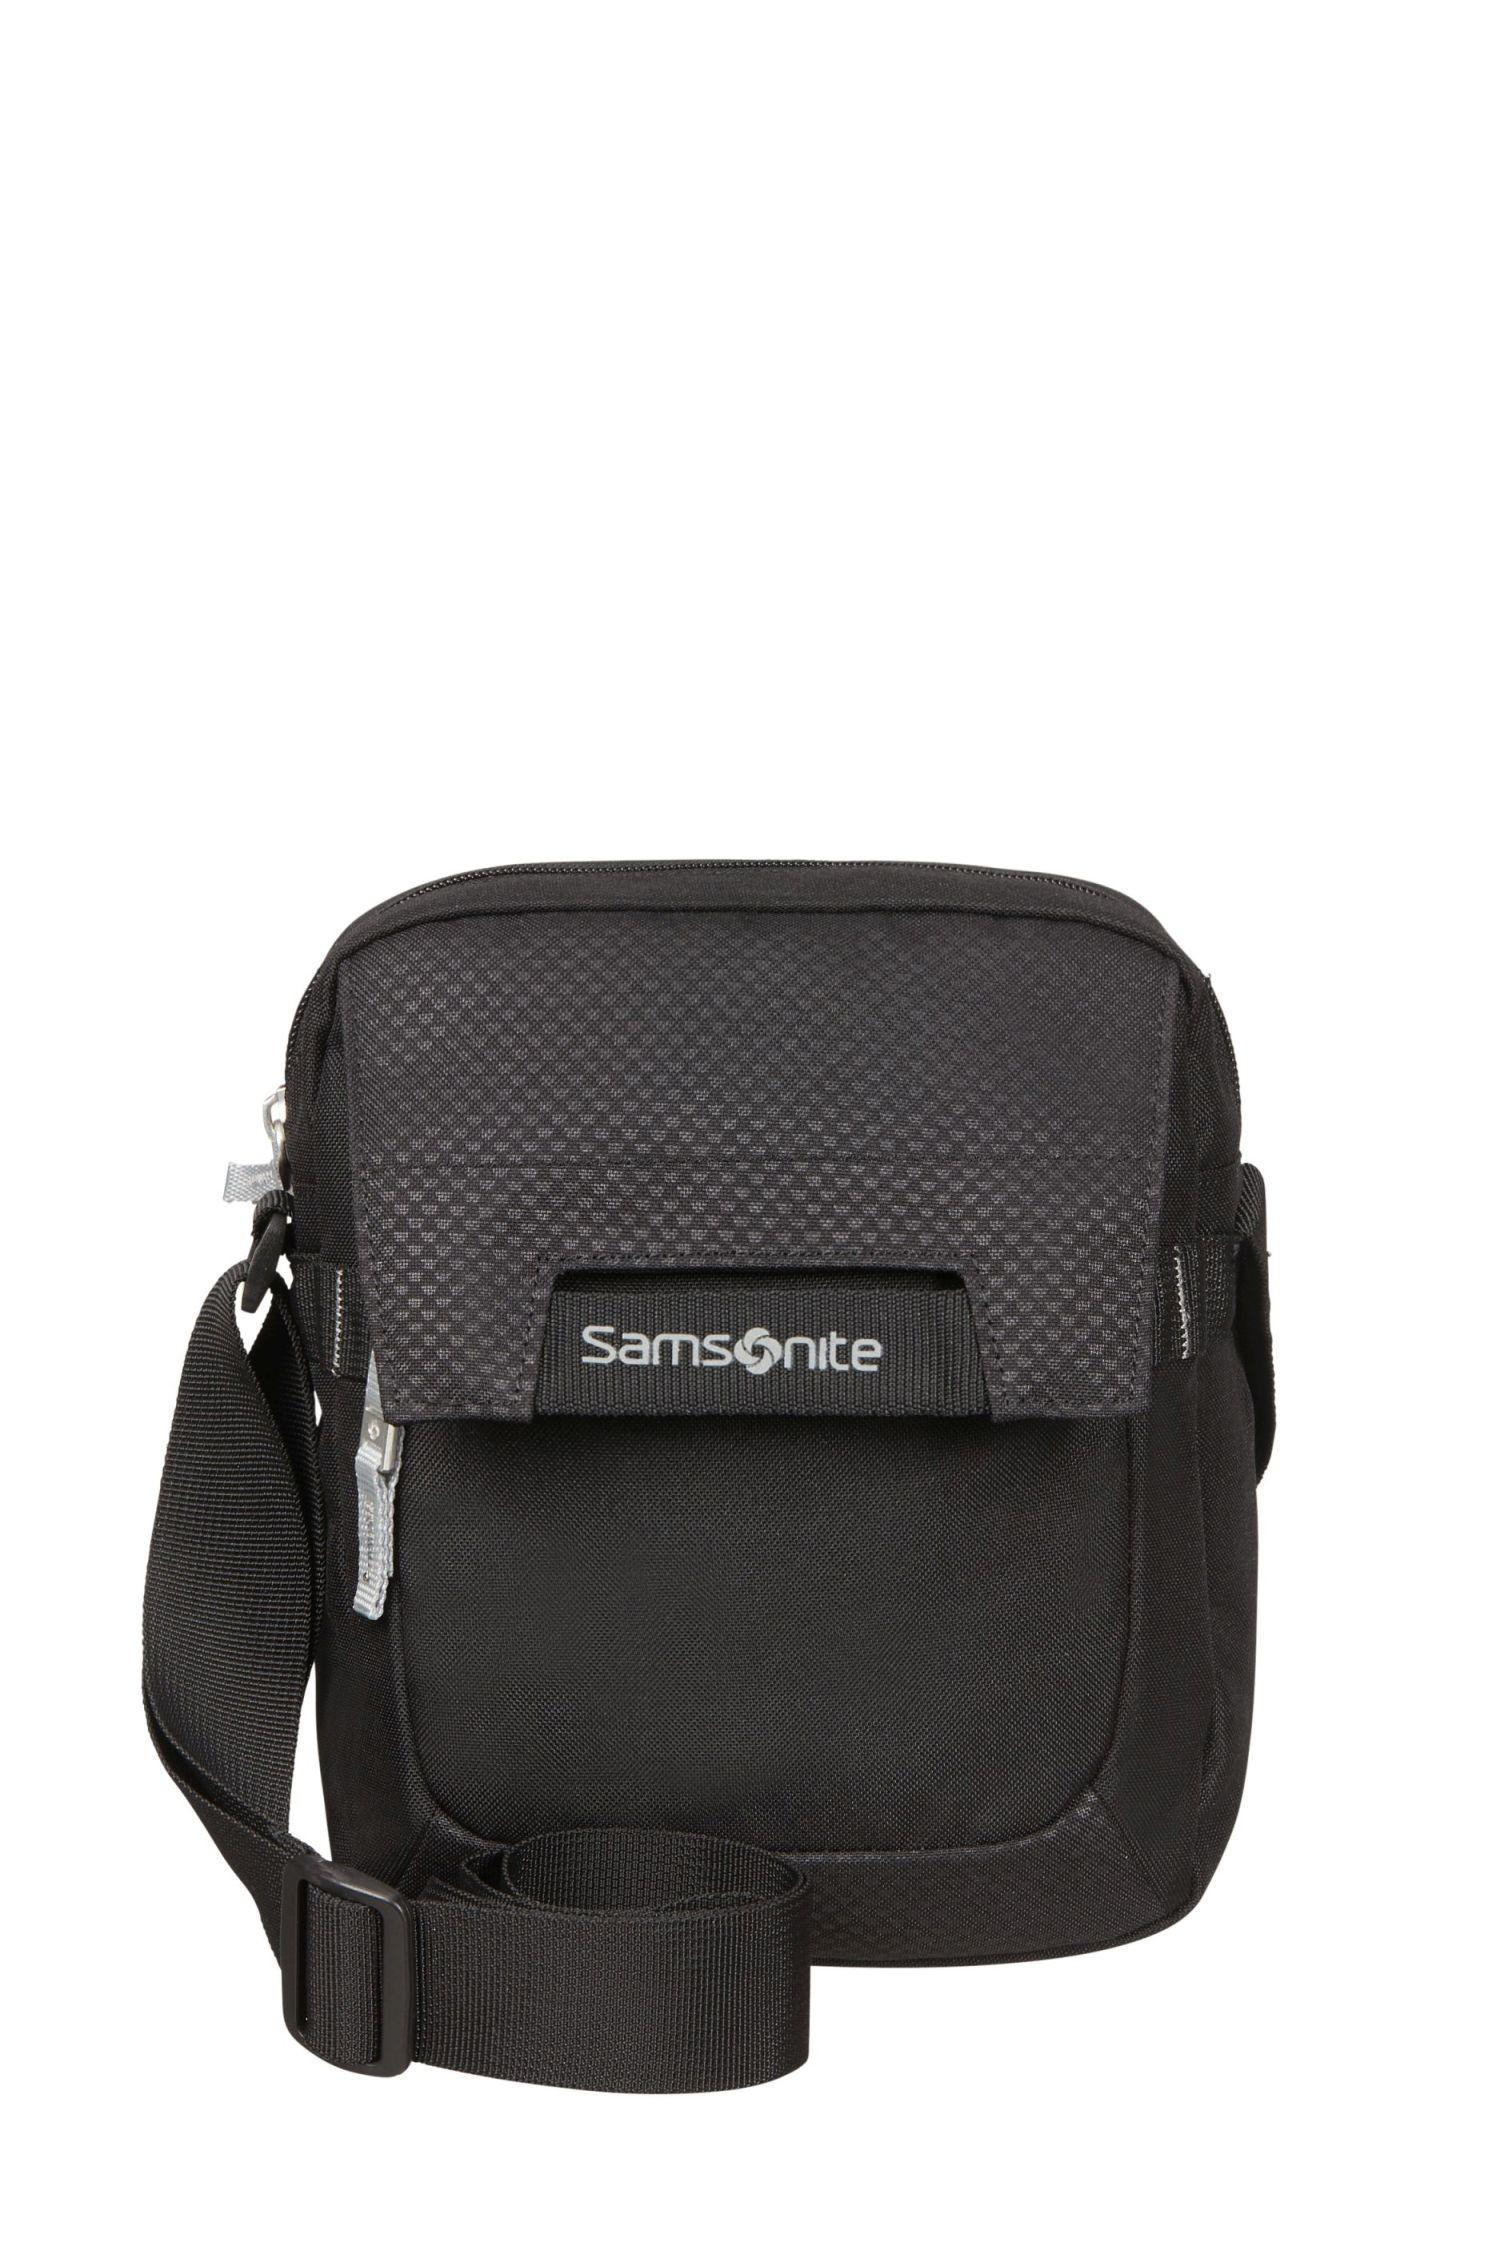 Samsonite Sonora Crossover Bag